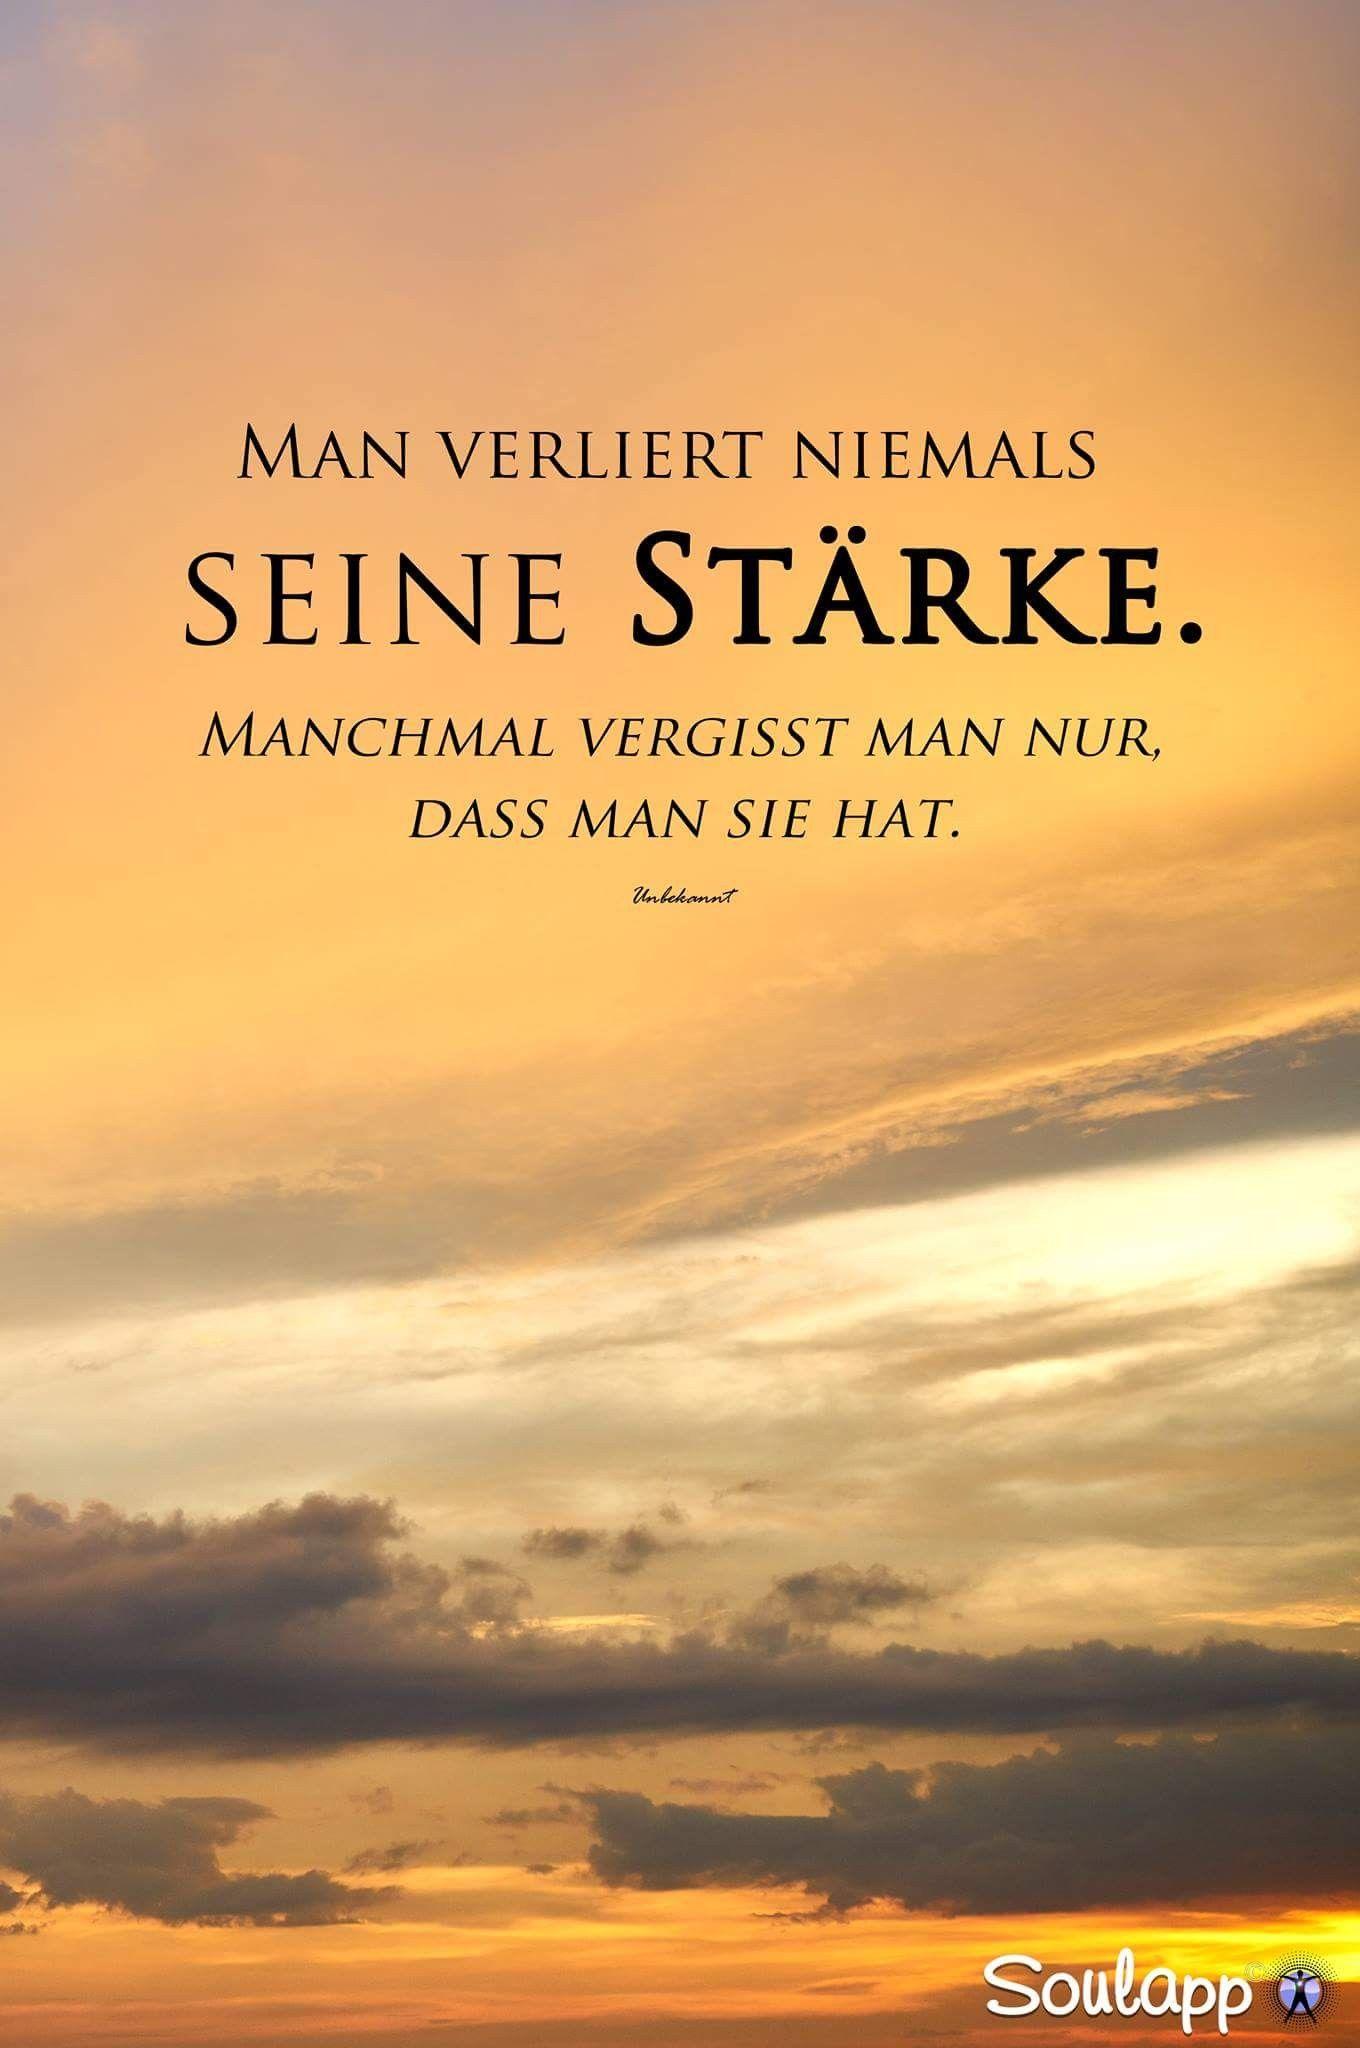 Weise Worte. Danke Daizo. ☀ | Et ass esou wouer! | Quotes, German